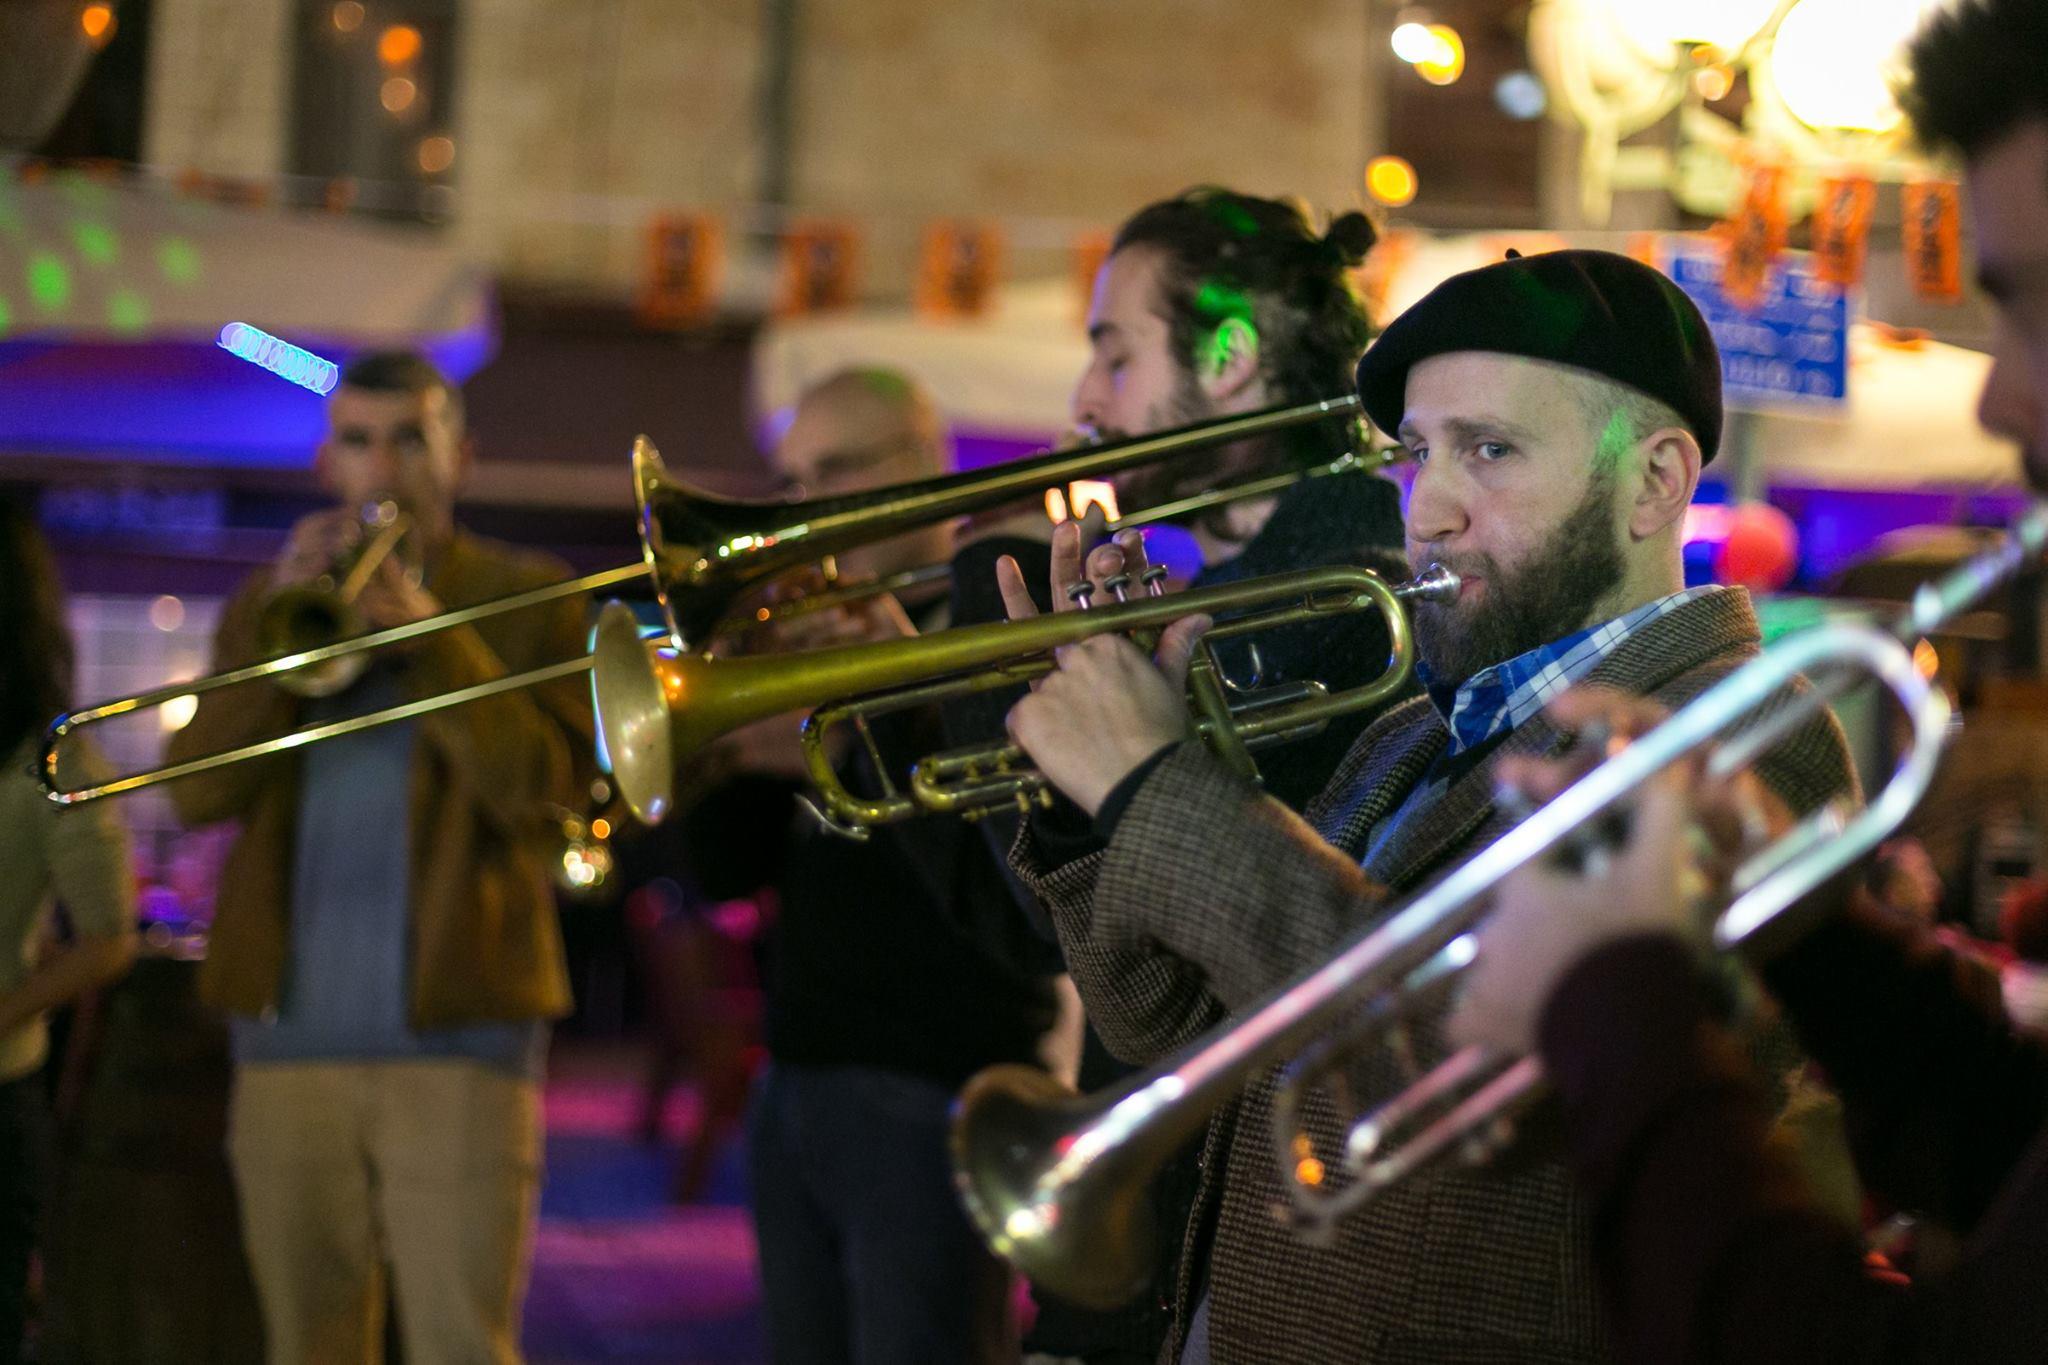 horn and trombone players perform at Shaon Horef Jerusalem winter festival